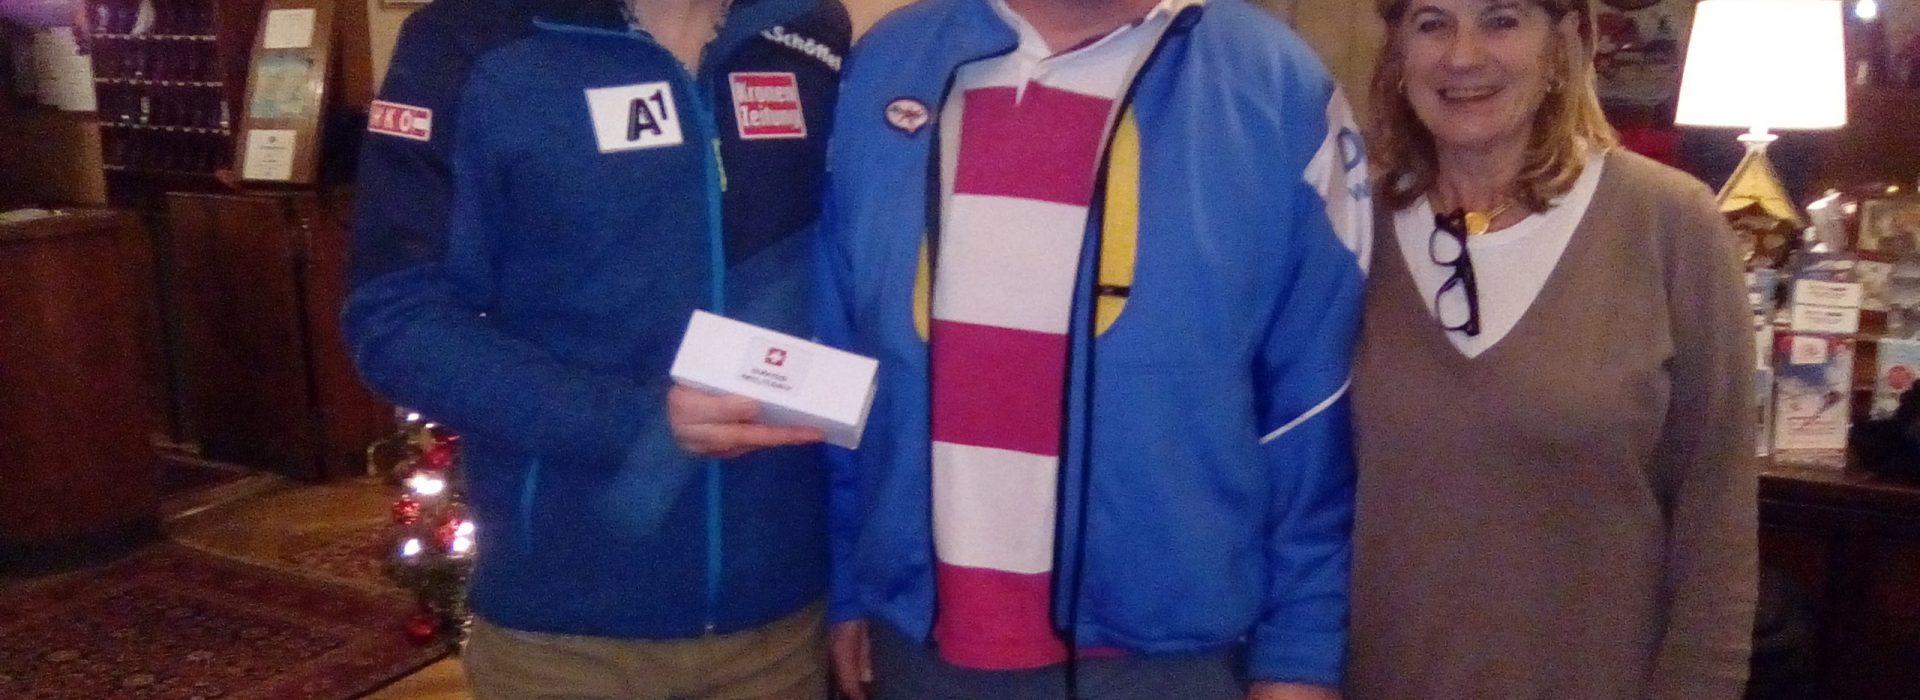 Joe Accepts His Prize Picture